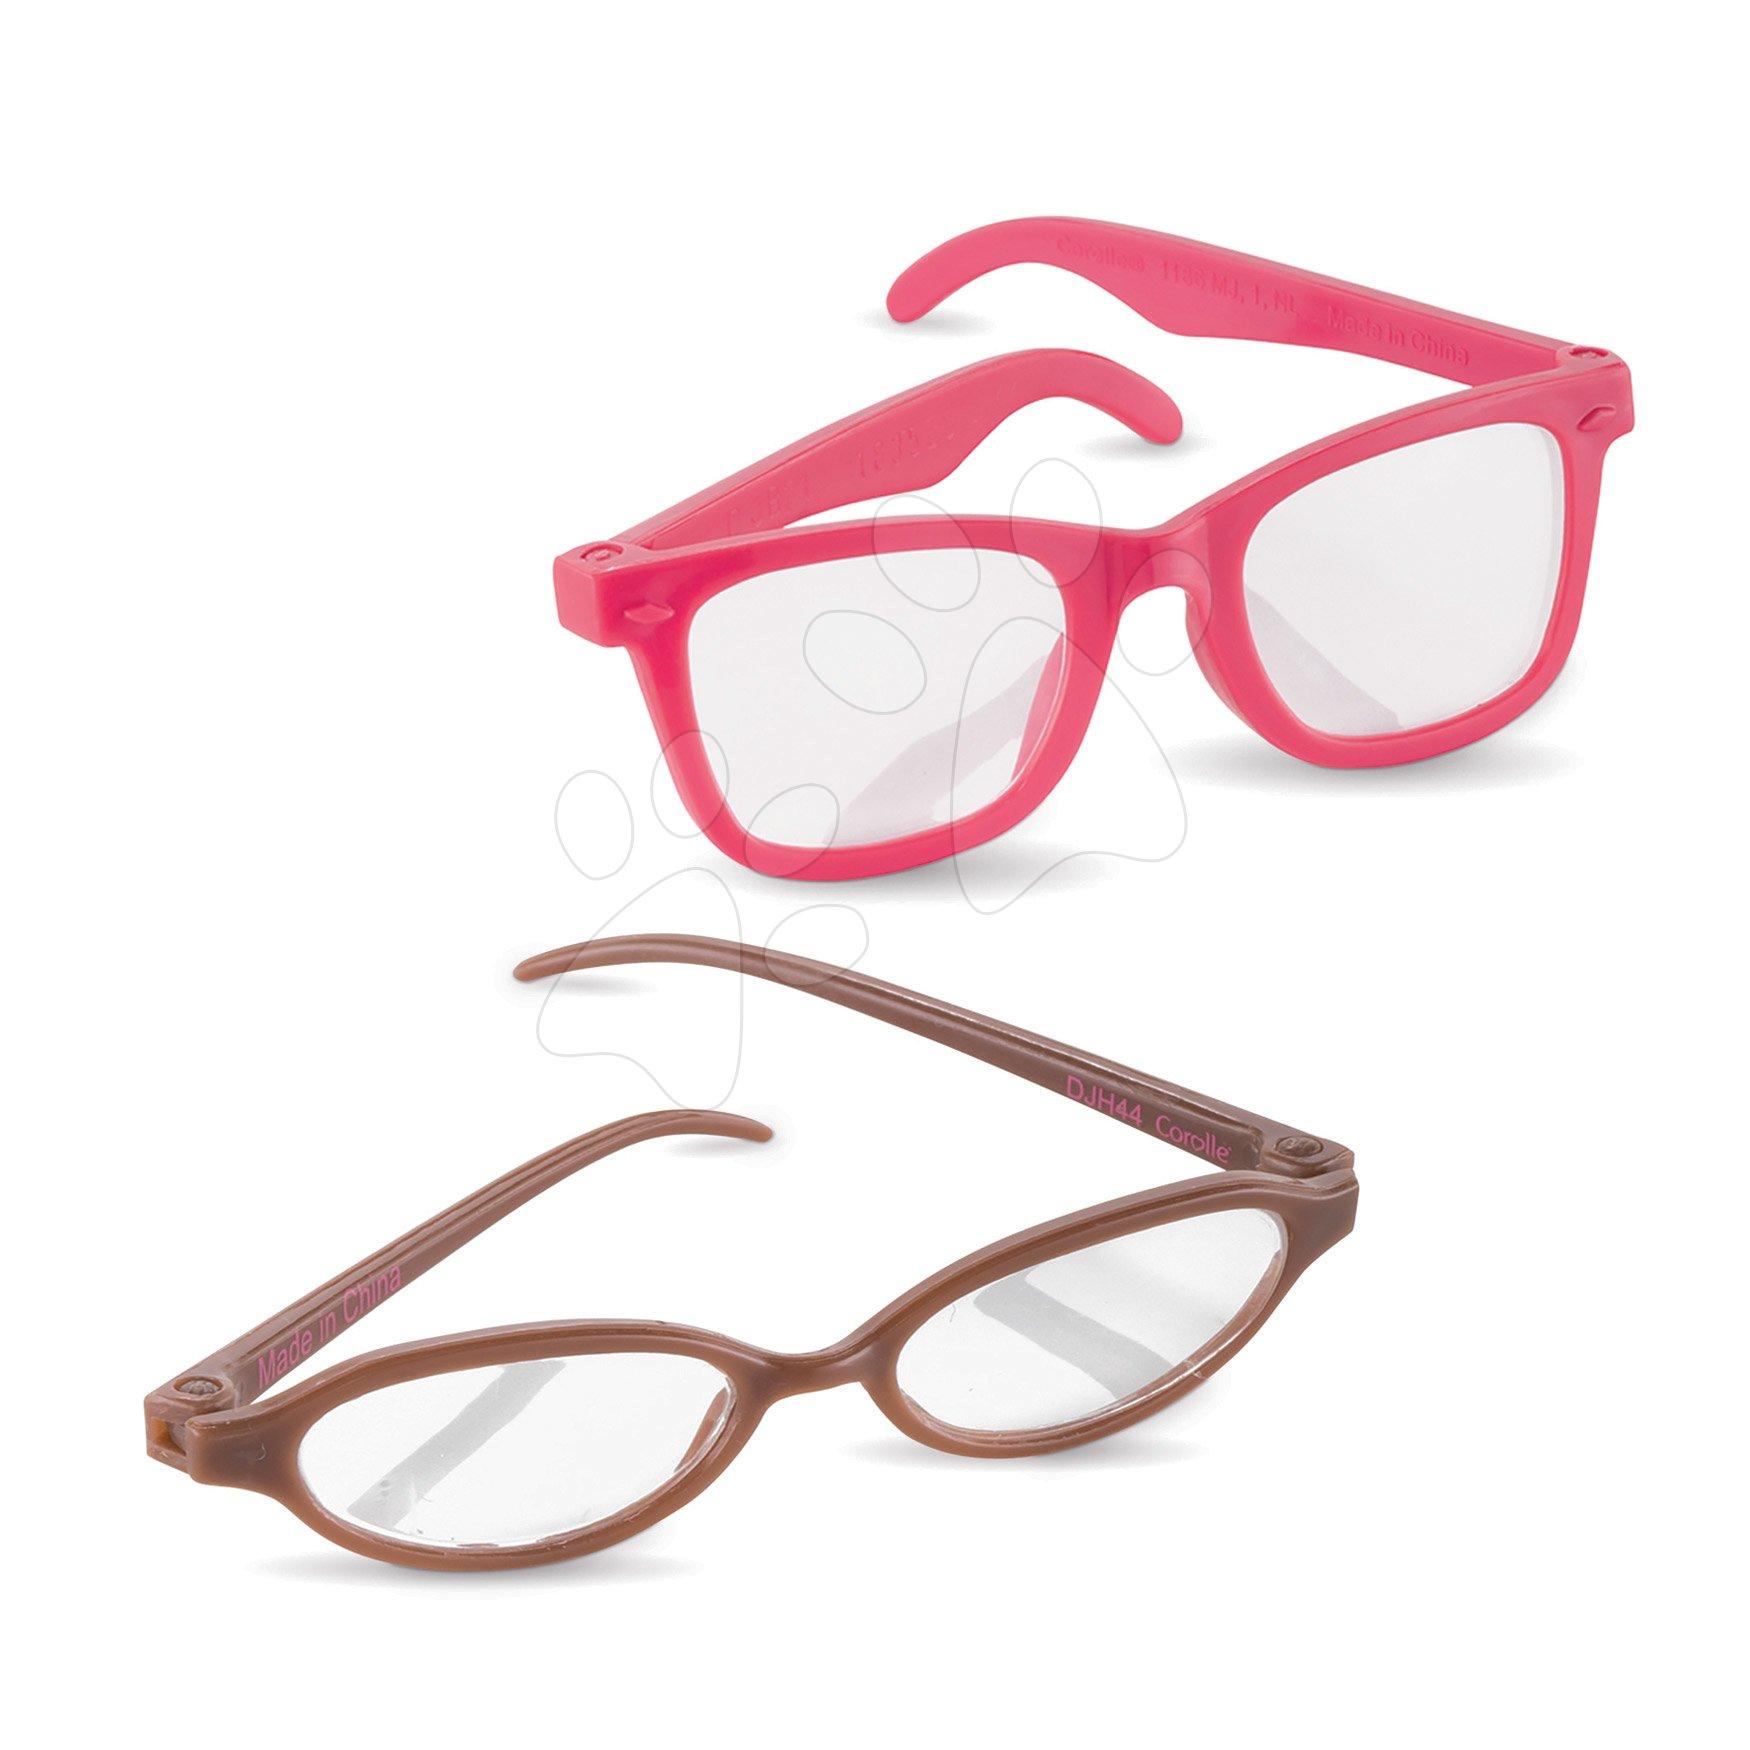 Okuliare Glasses Ma Corolle 1 kus pre 36 cm bábiku od 4 rokov